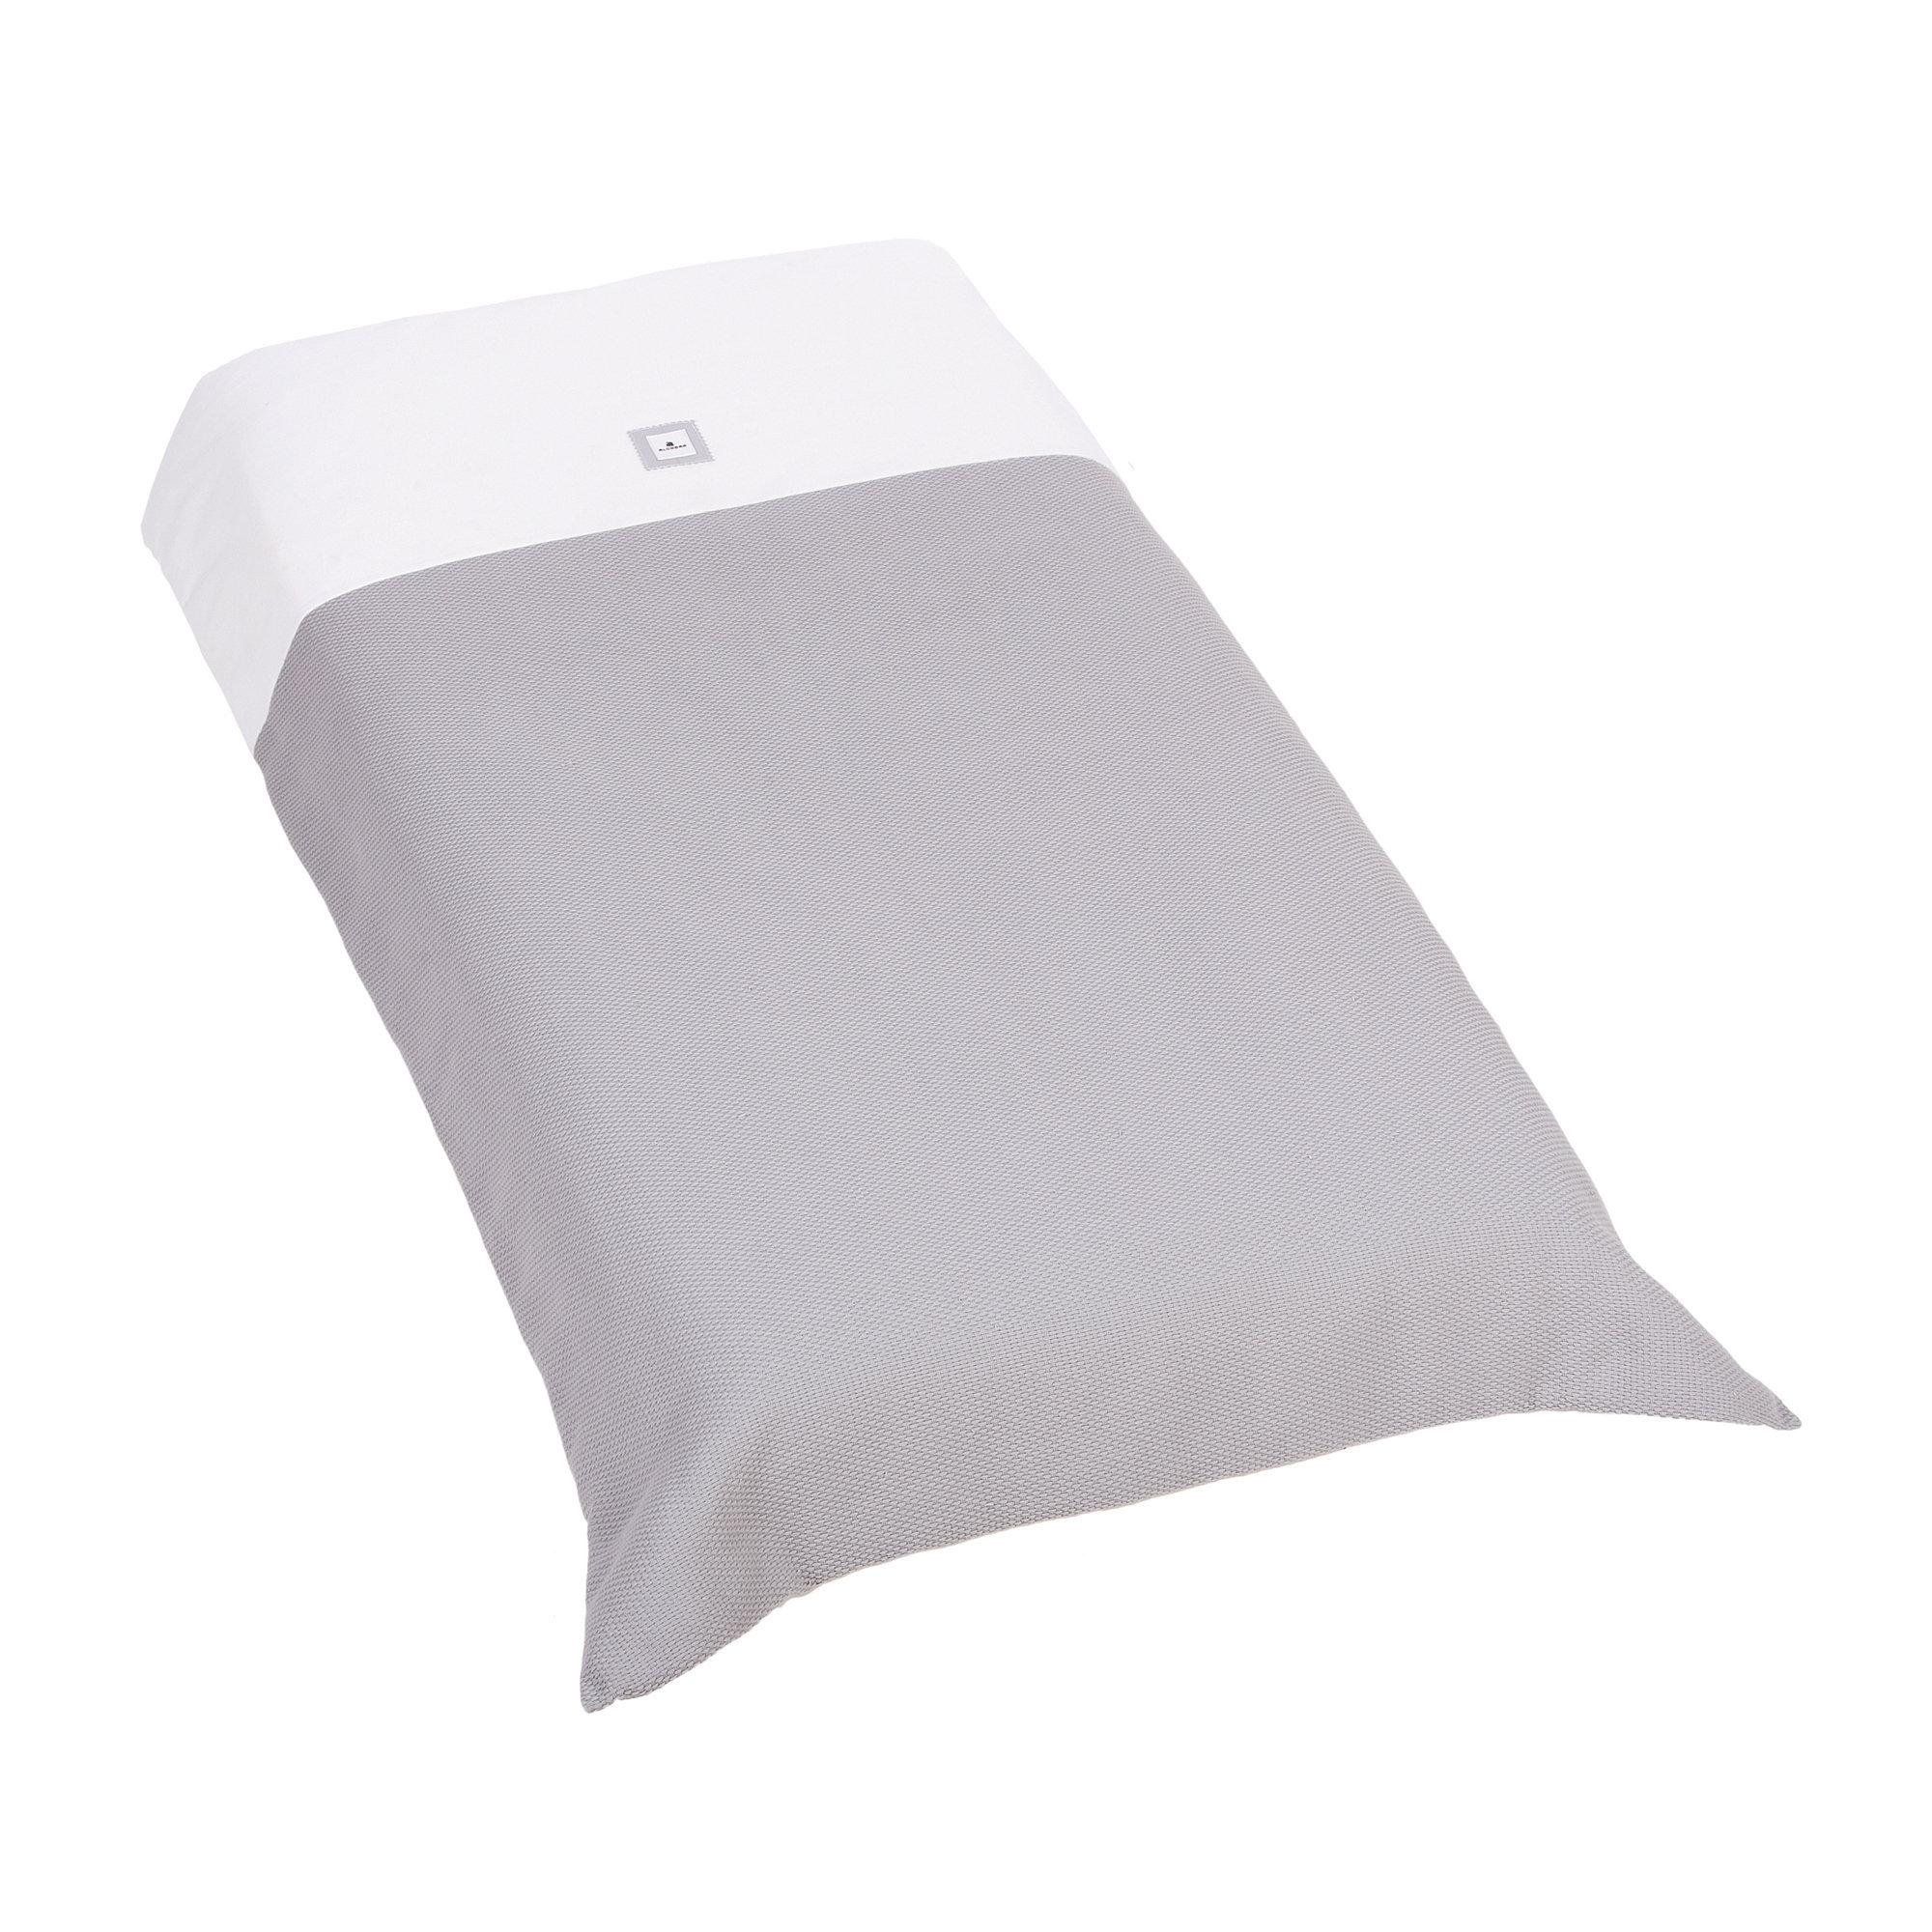 Nórdico de cuna transformable en cama Galaxy 70x140cm con relleno desenfundable